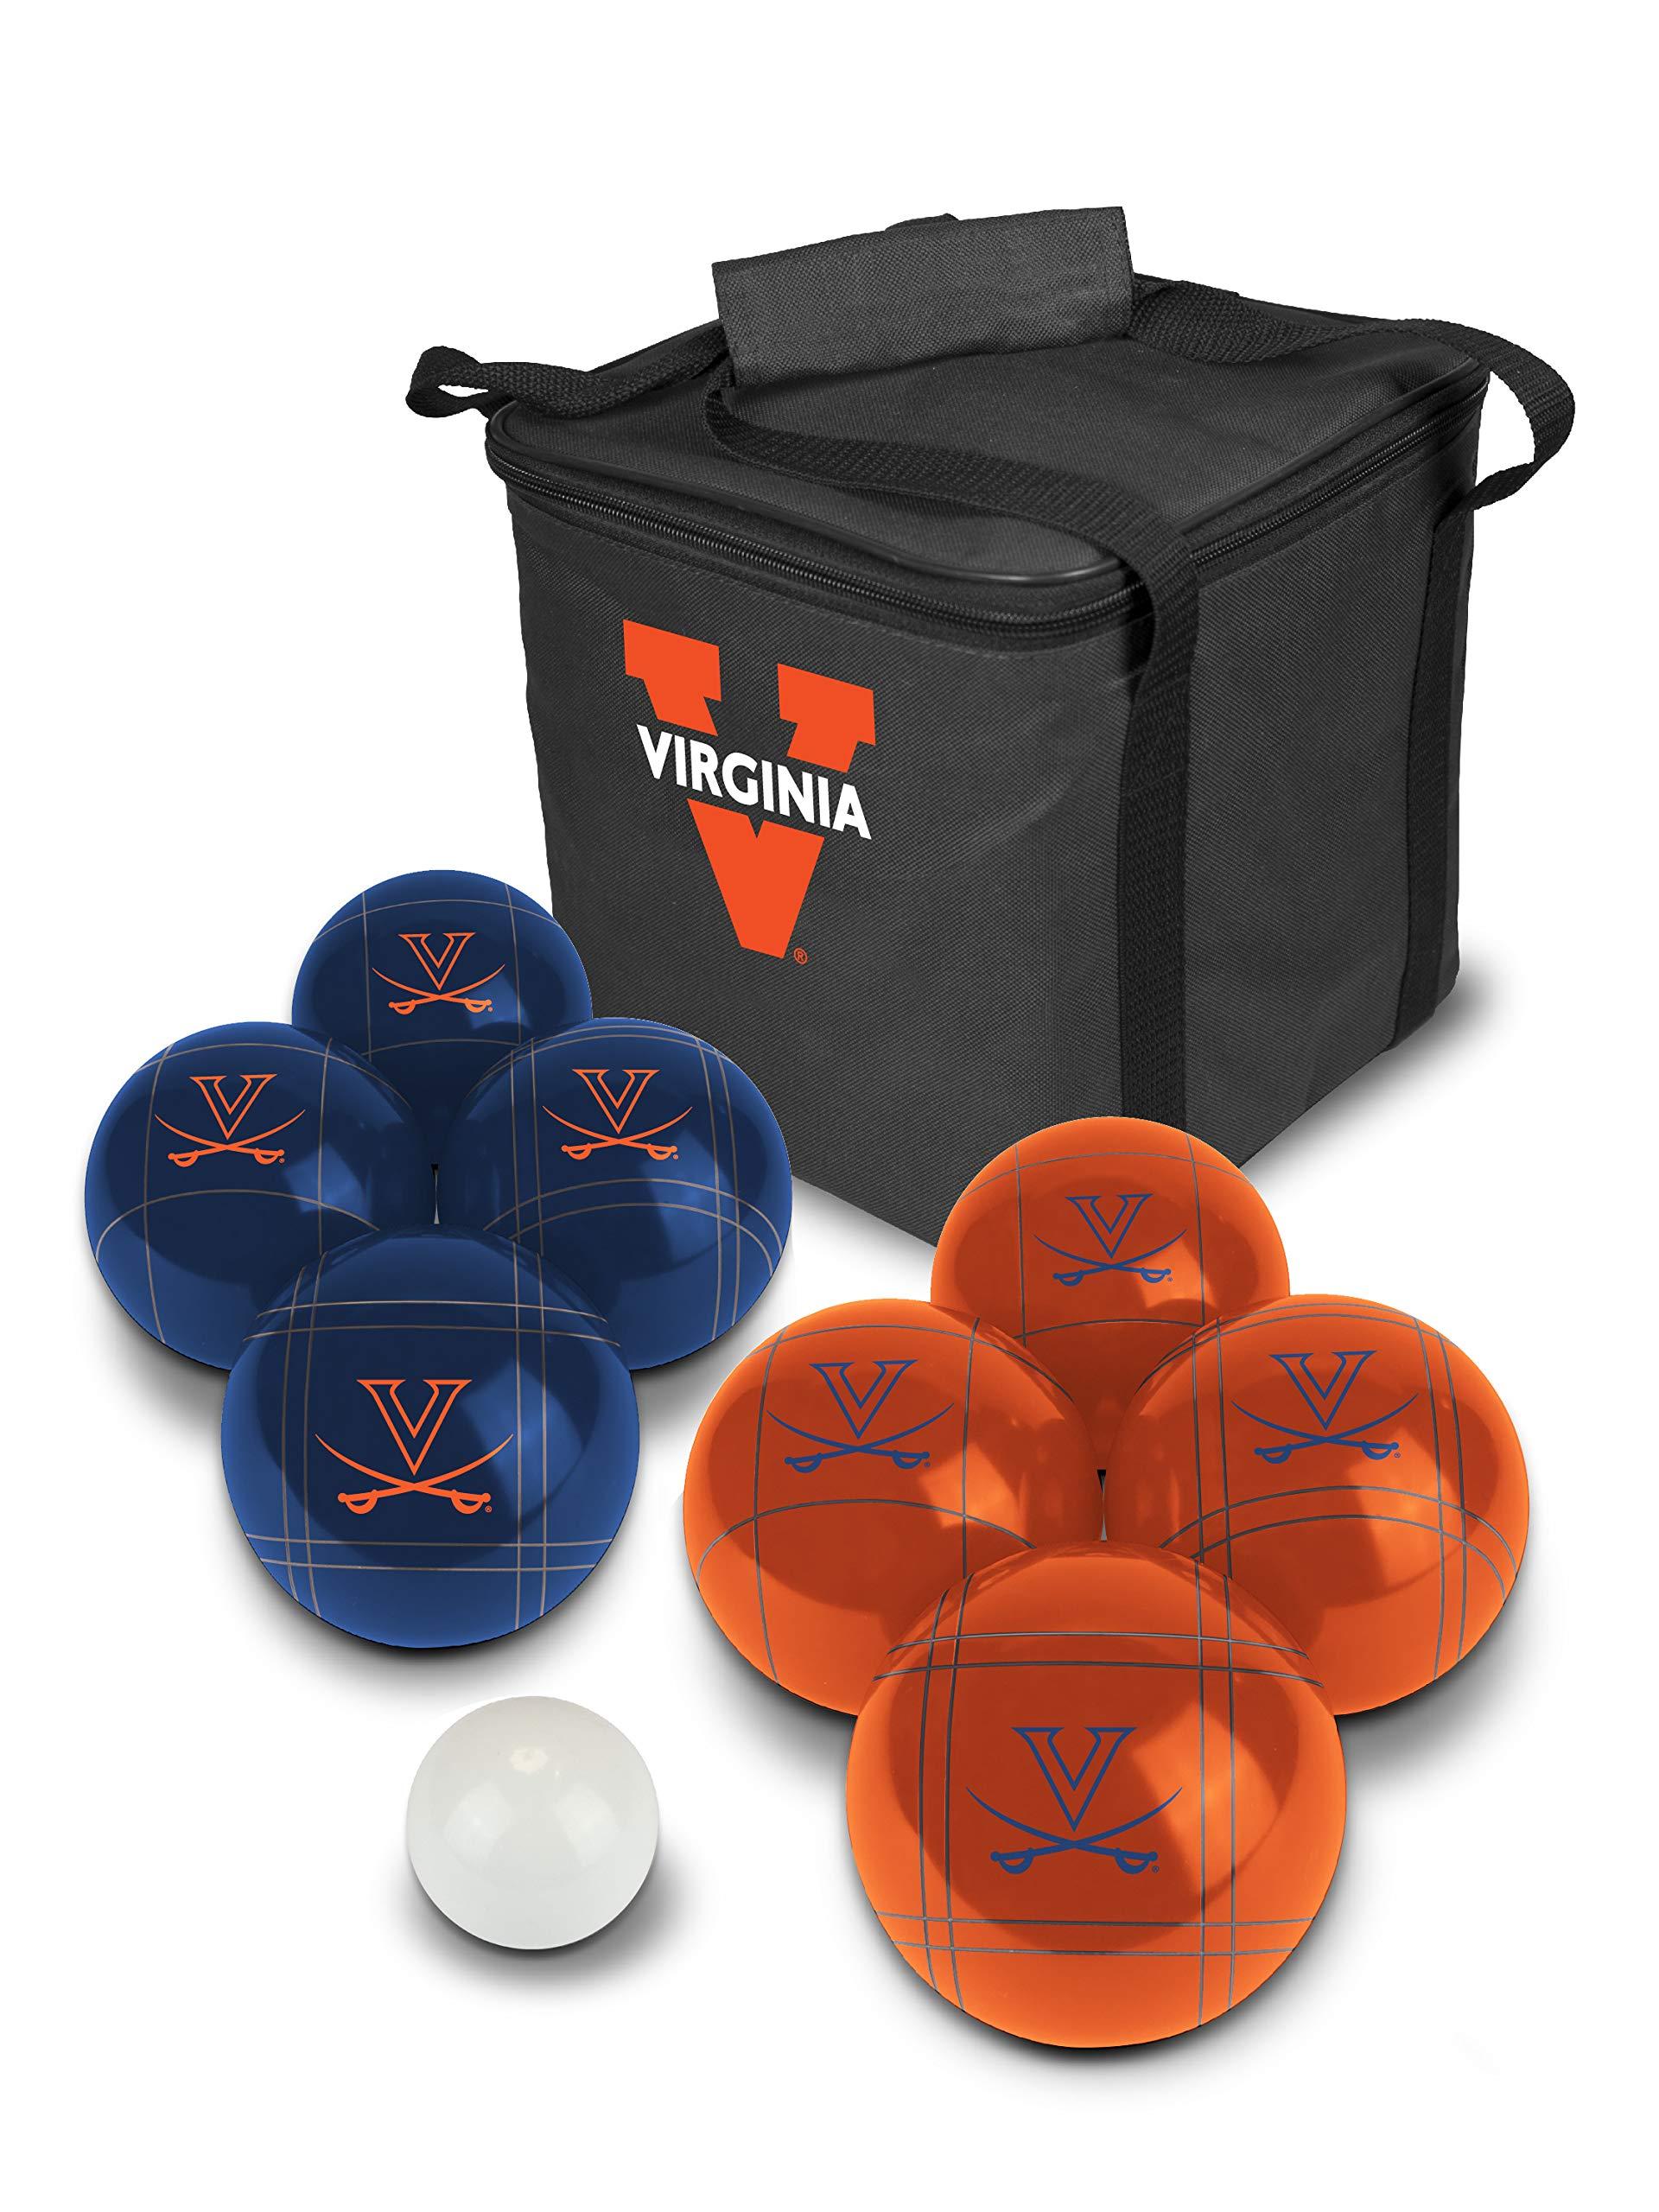 PROLINE NCAA College Virginia Cavaliers Bocce Ball Set by PROLINE